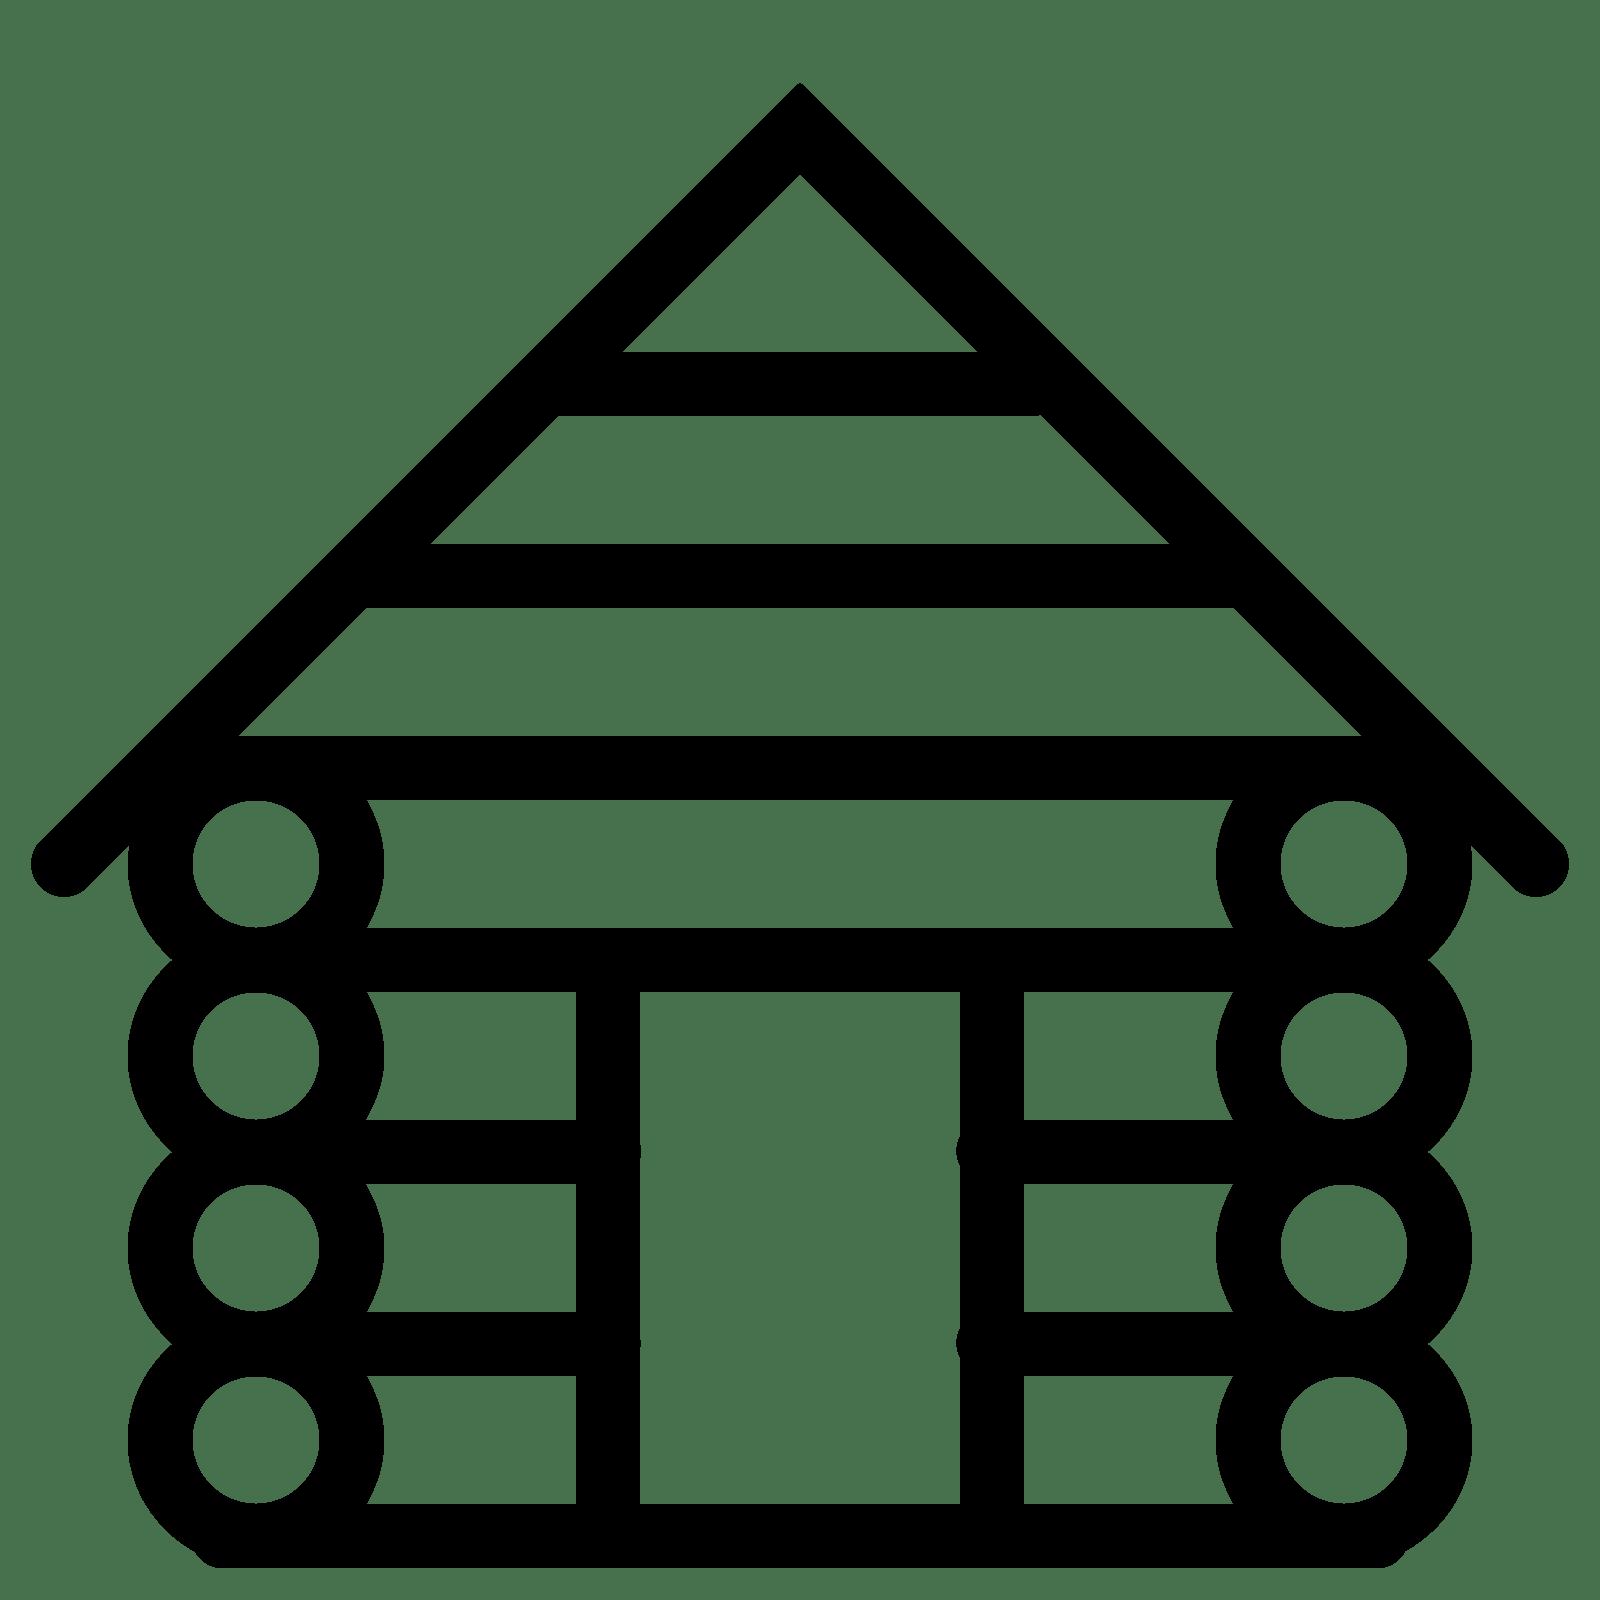 Cabin png free transparent. Cottage clipart hut